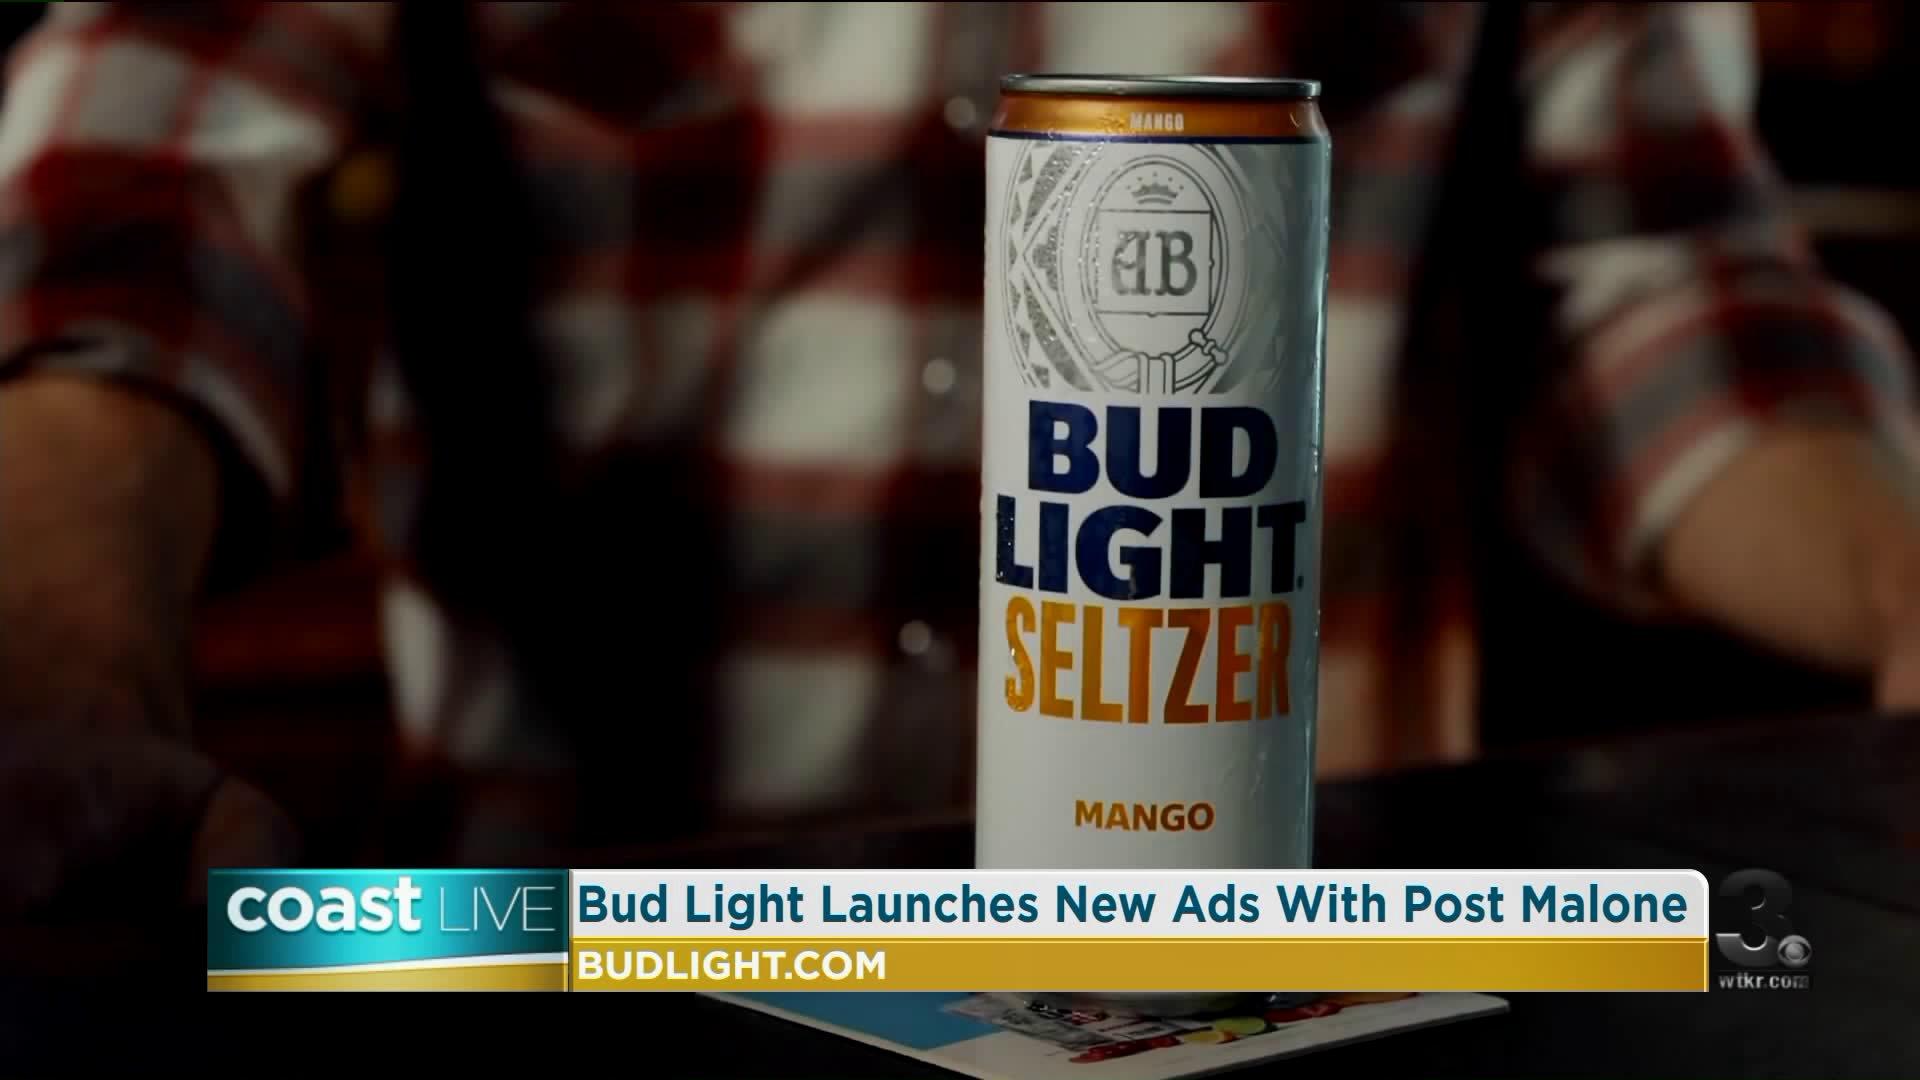 bud light super bowl 2020